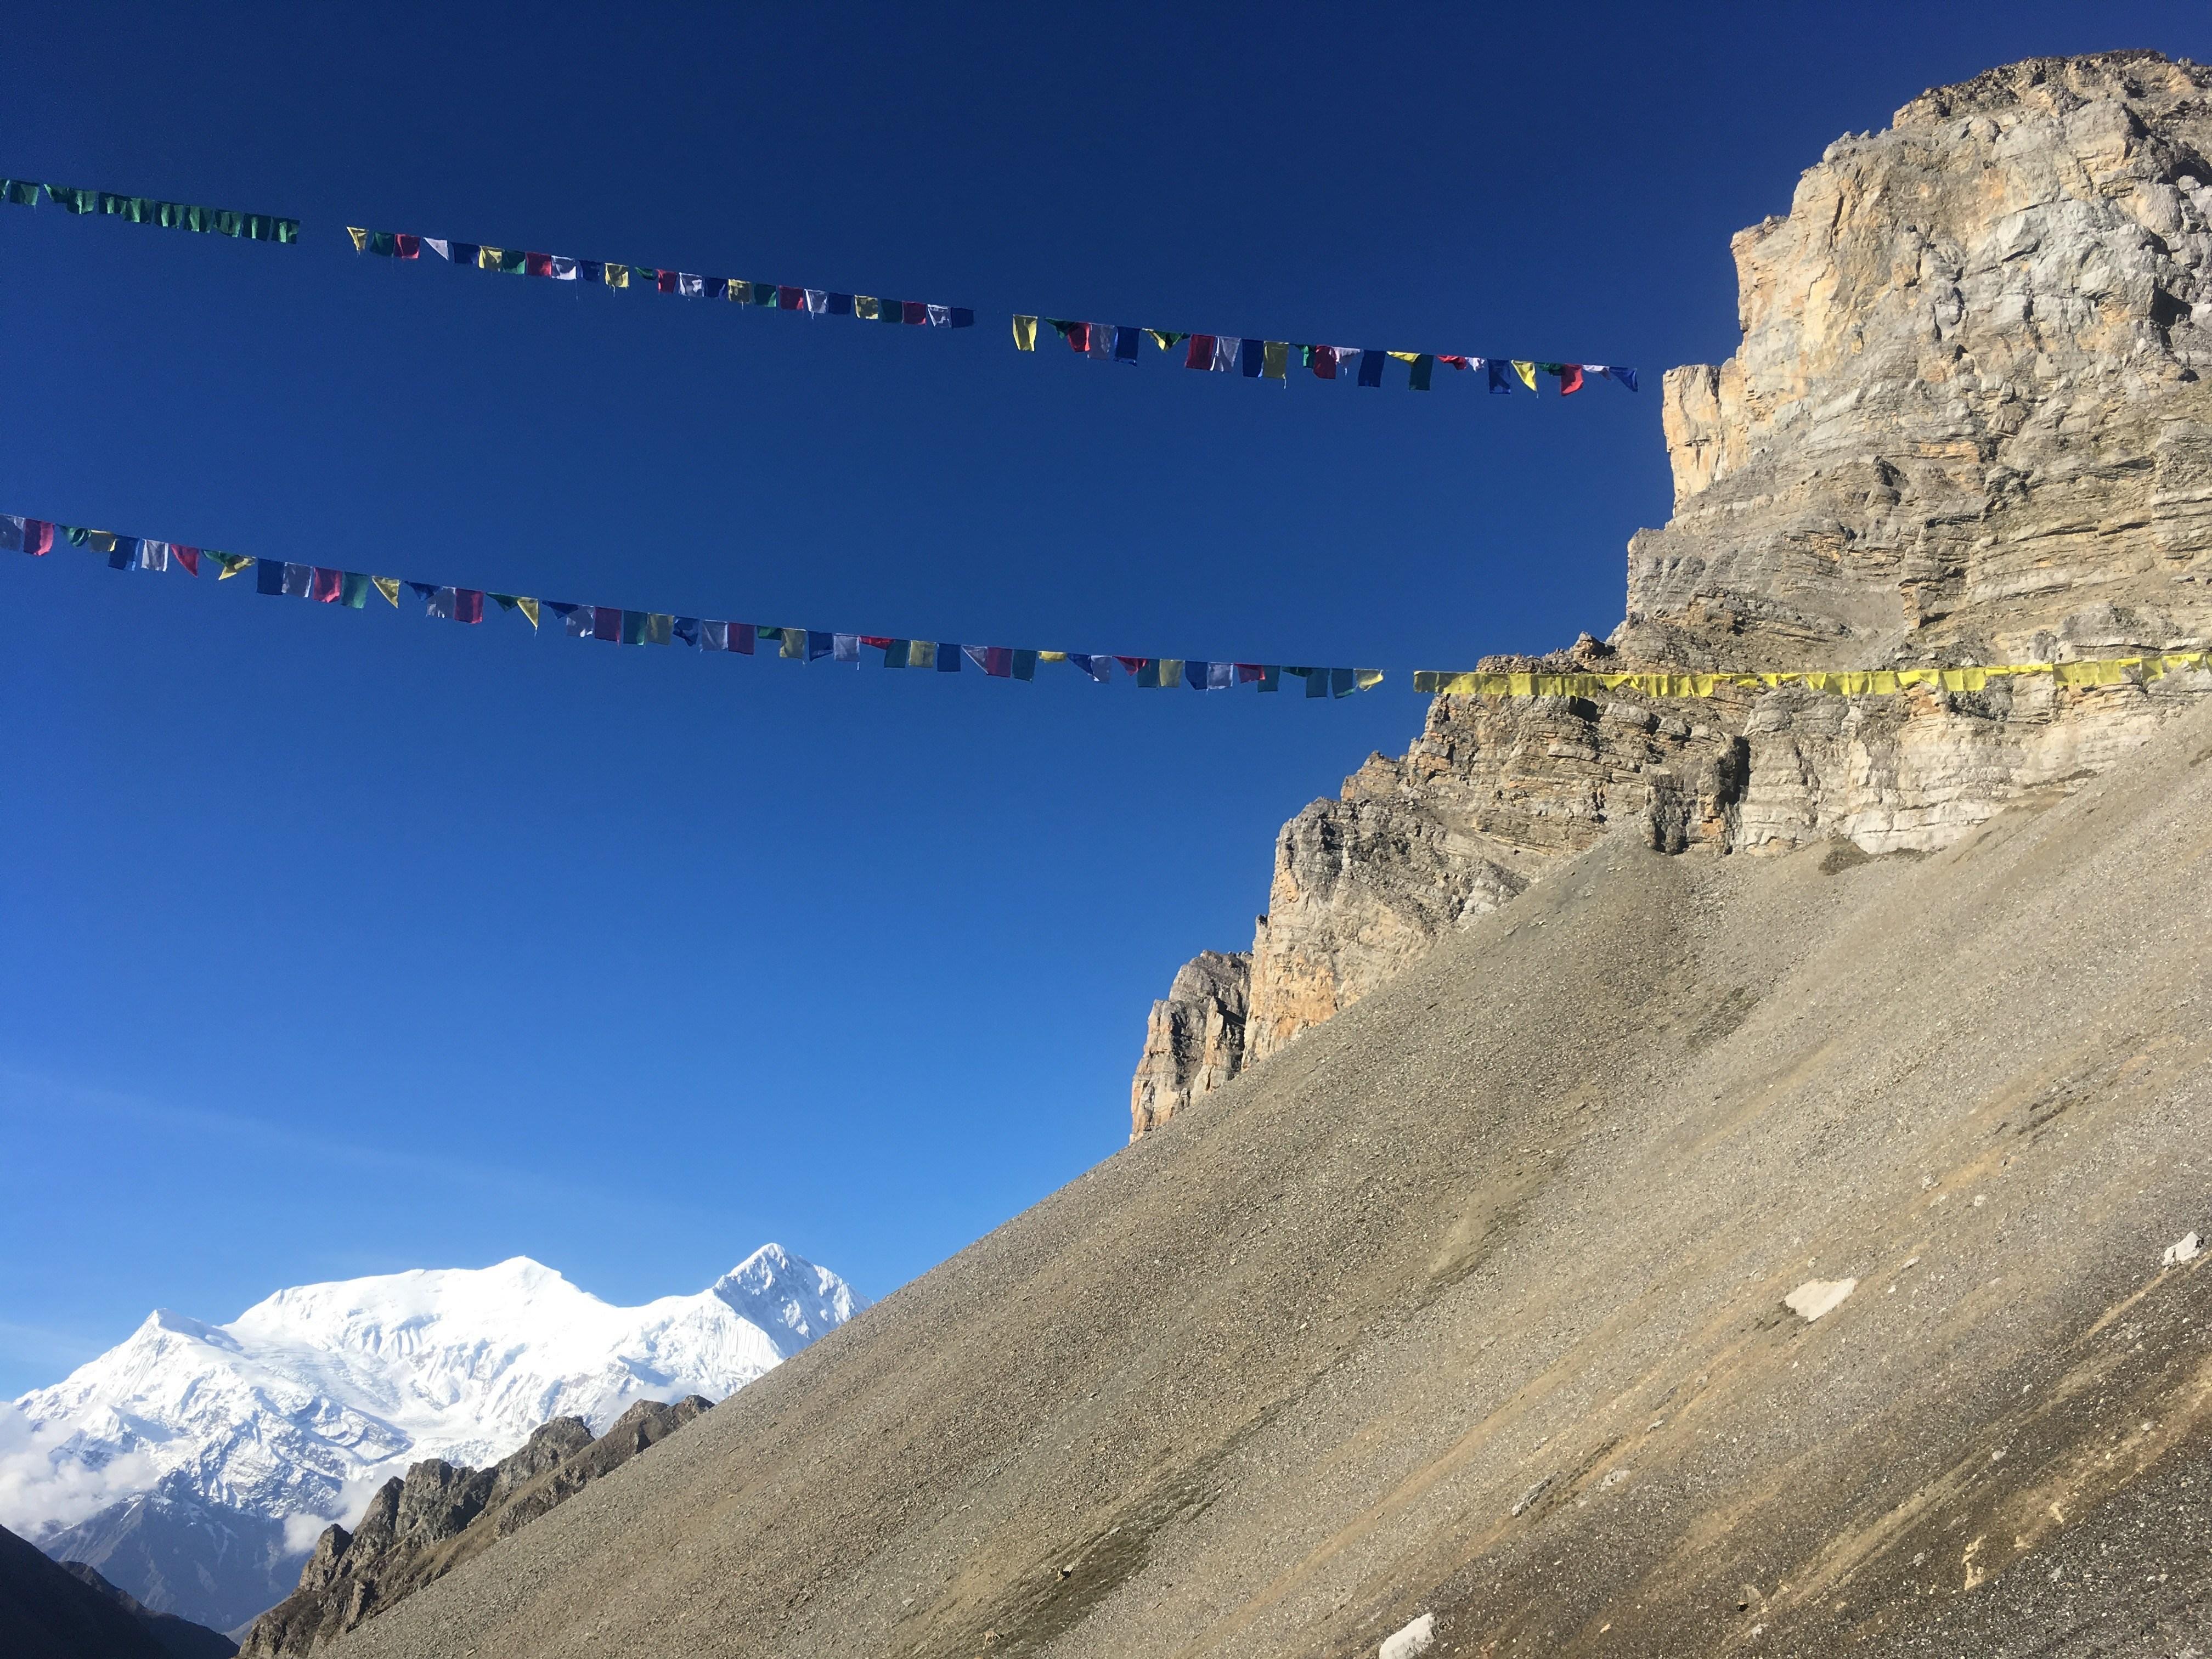 An 800 mile trek across Nepal's Great Himalaya Trail.